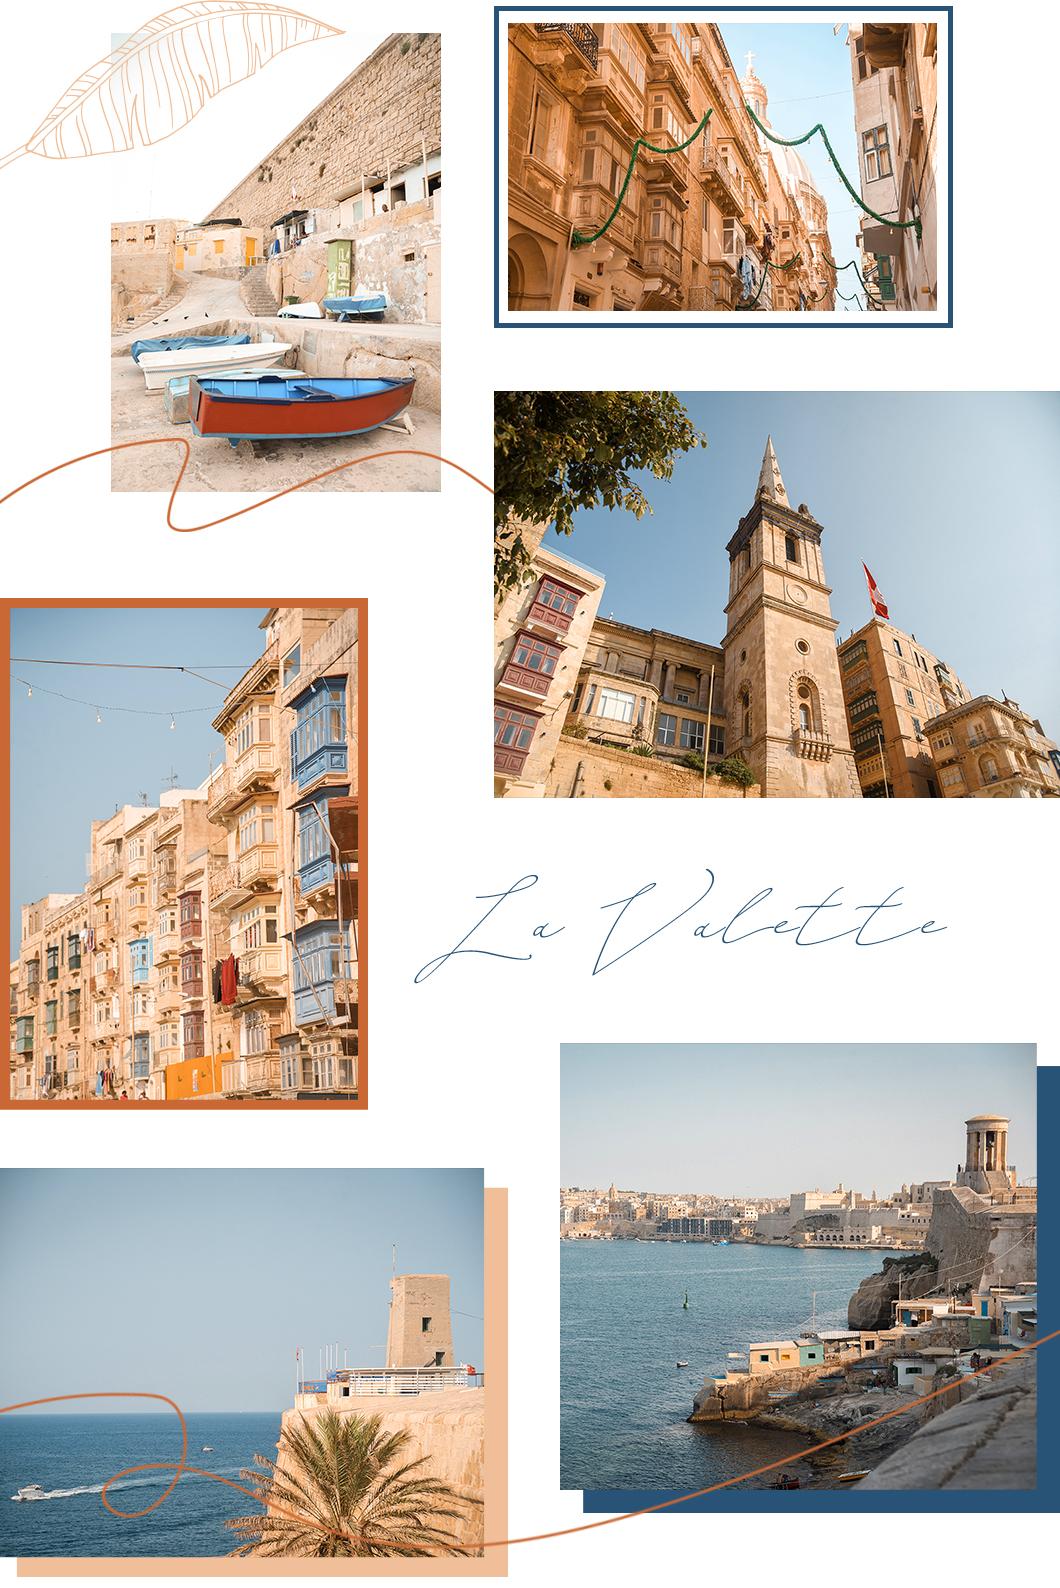 Visiter La Valette à Malte